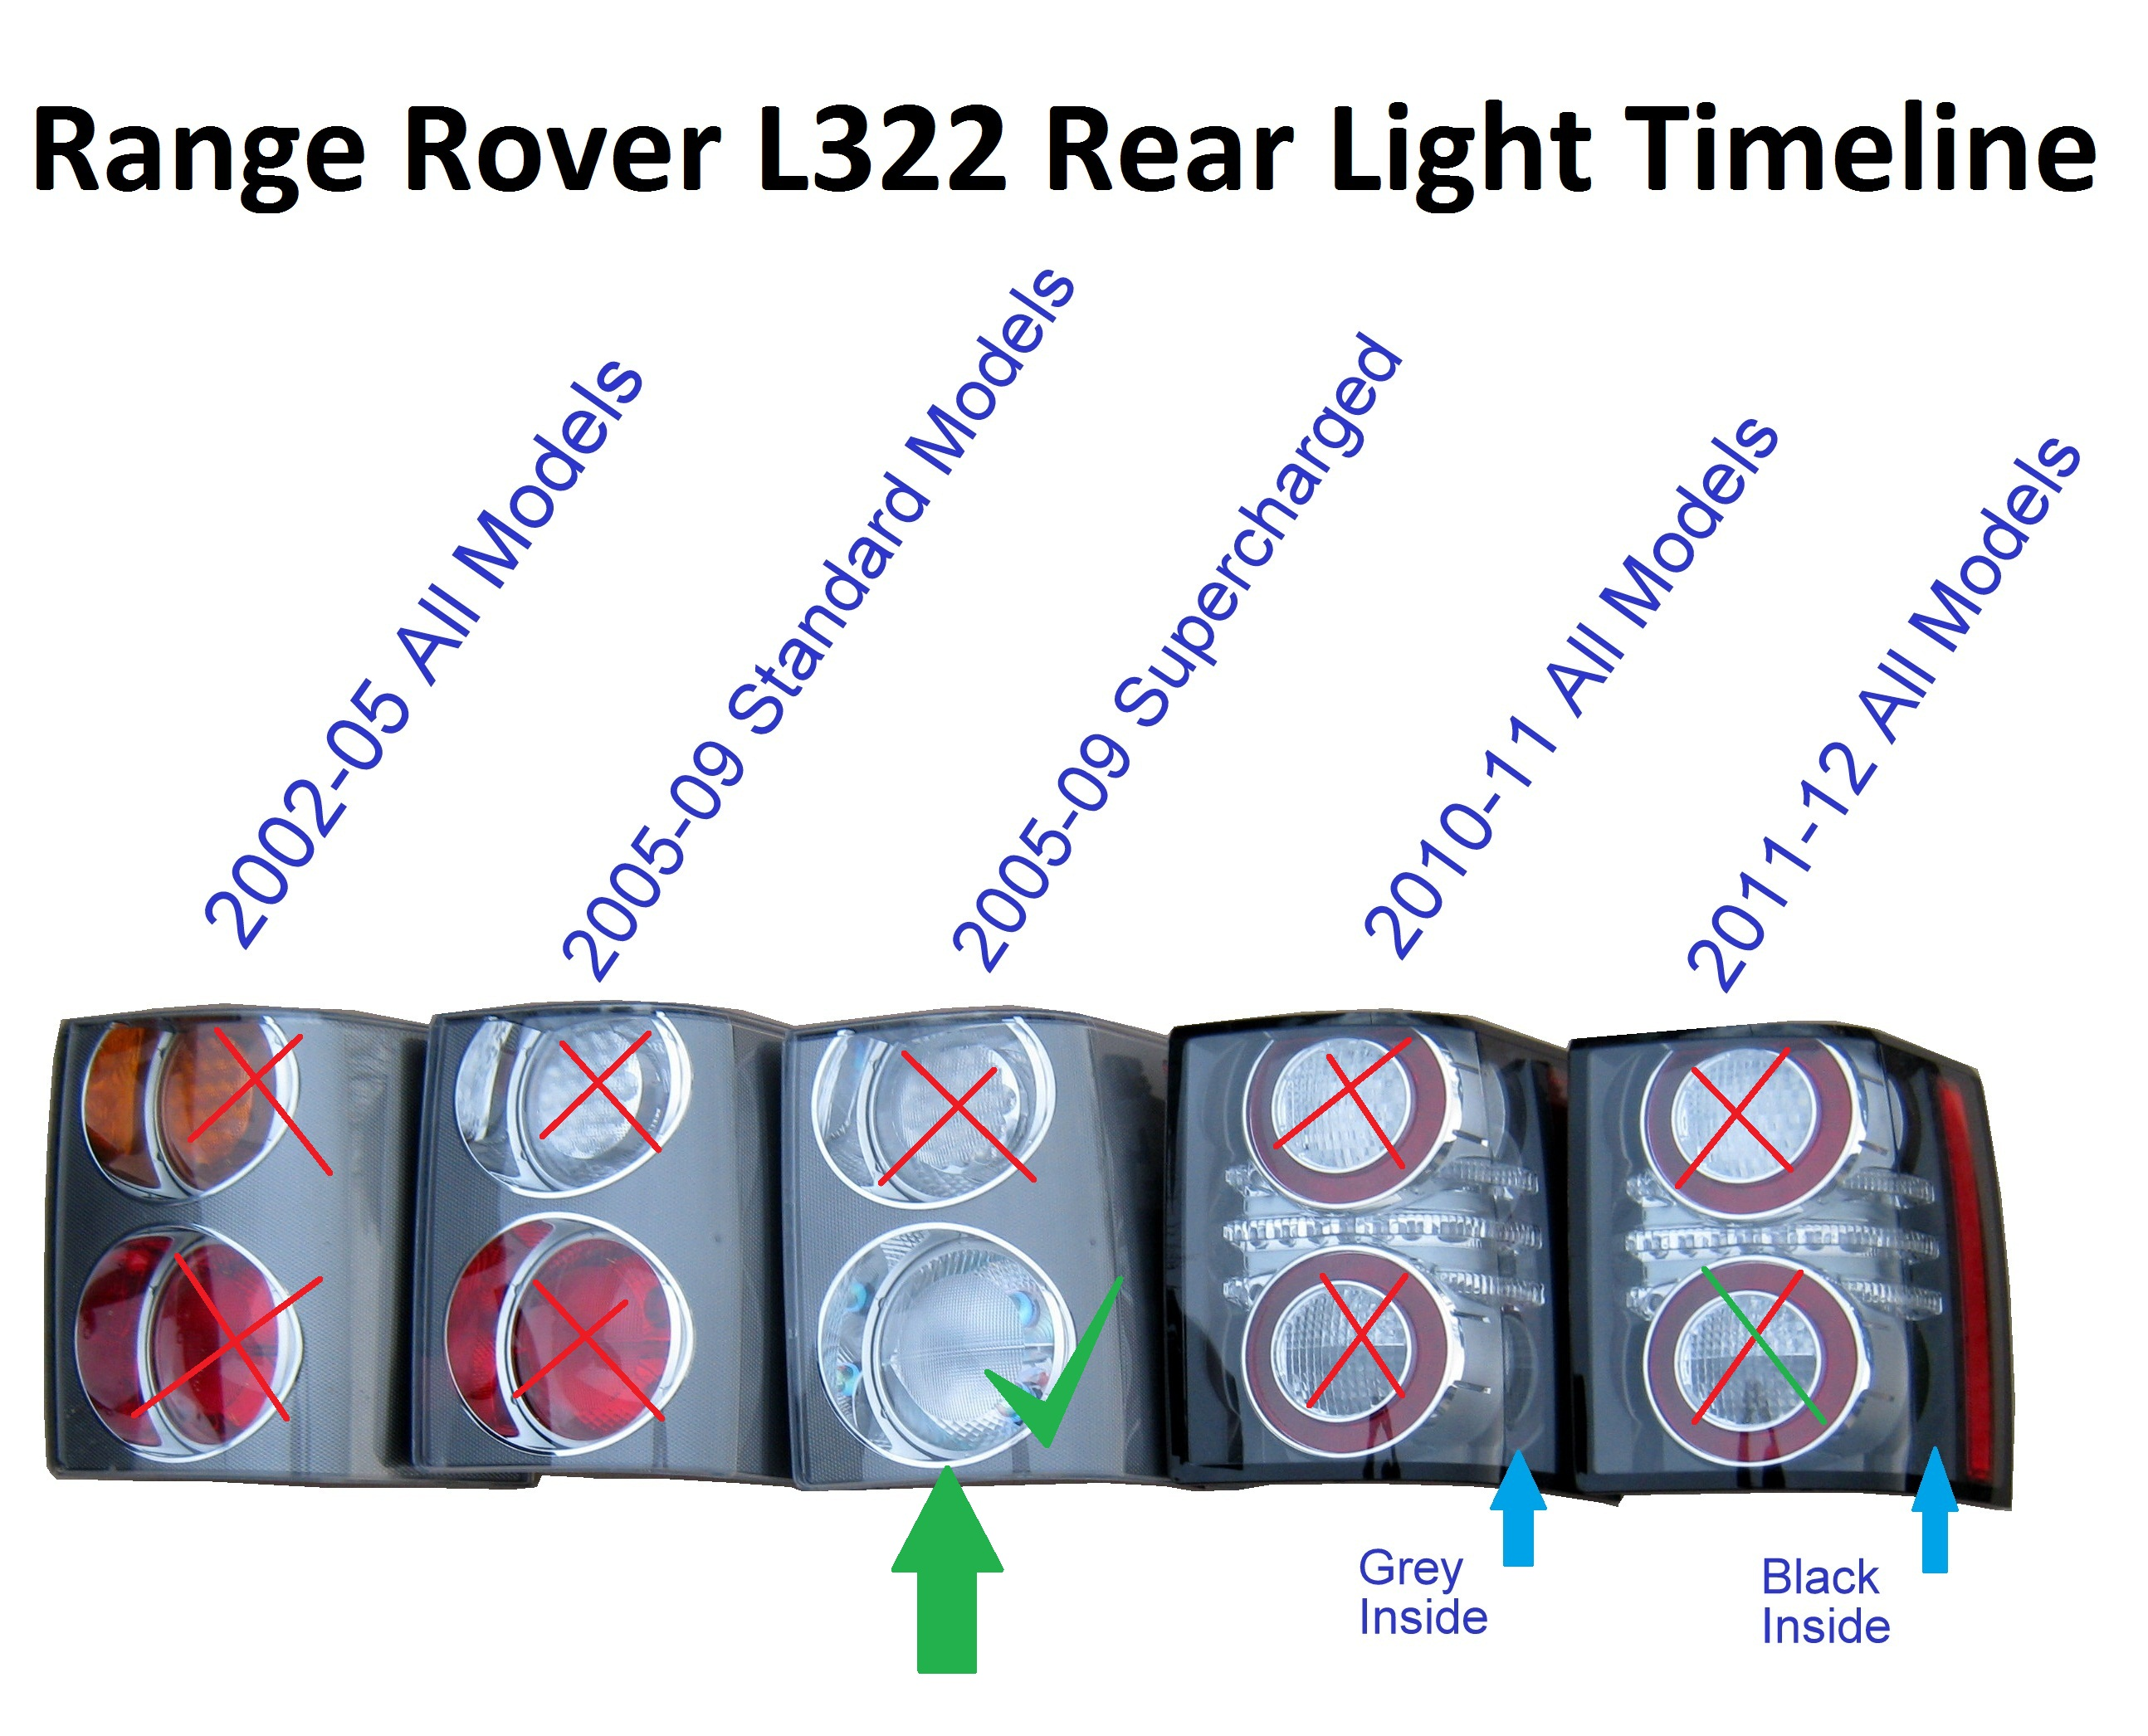 freelander wiring diagram 2002 hyundai accent radio silver tail/fog lamp bulb range rover l322 supercharged rear lights xzq500110 | ebay